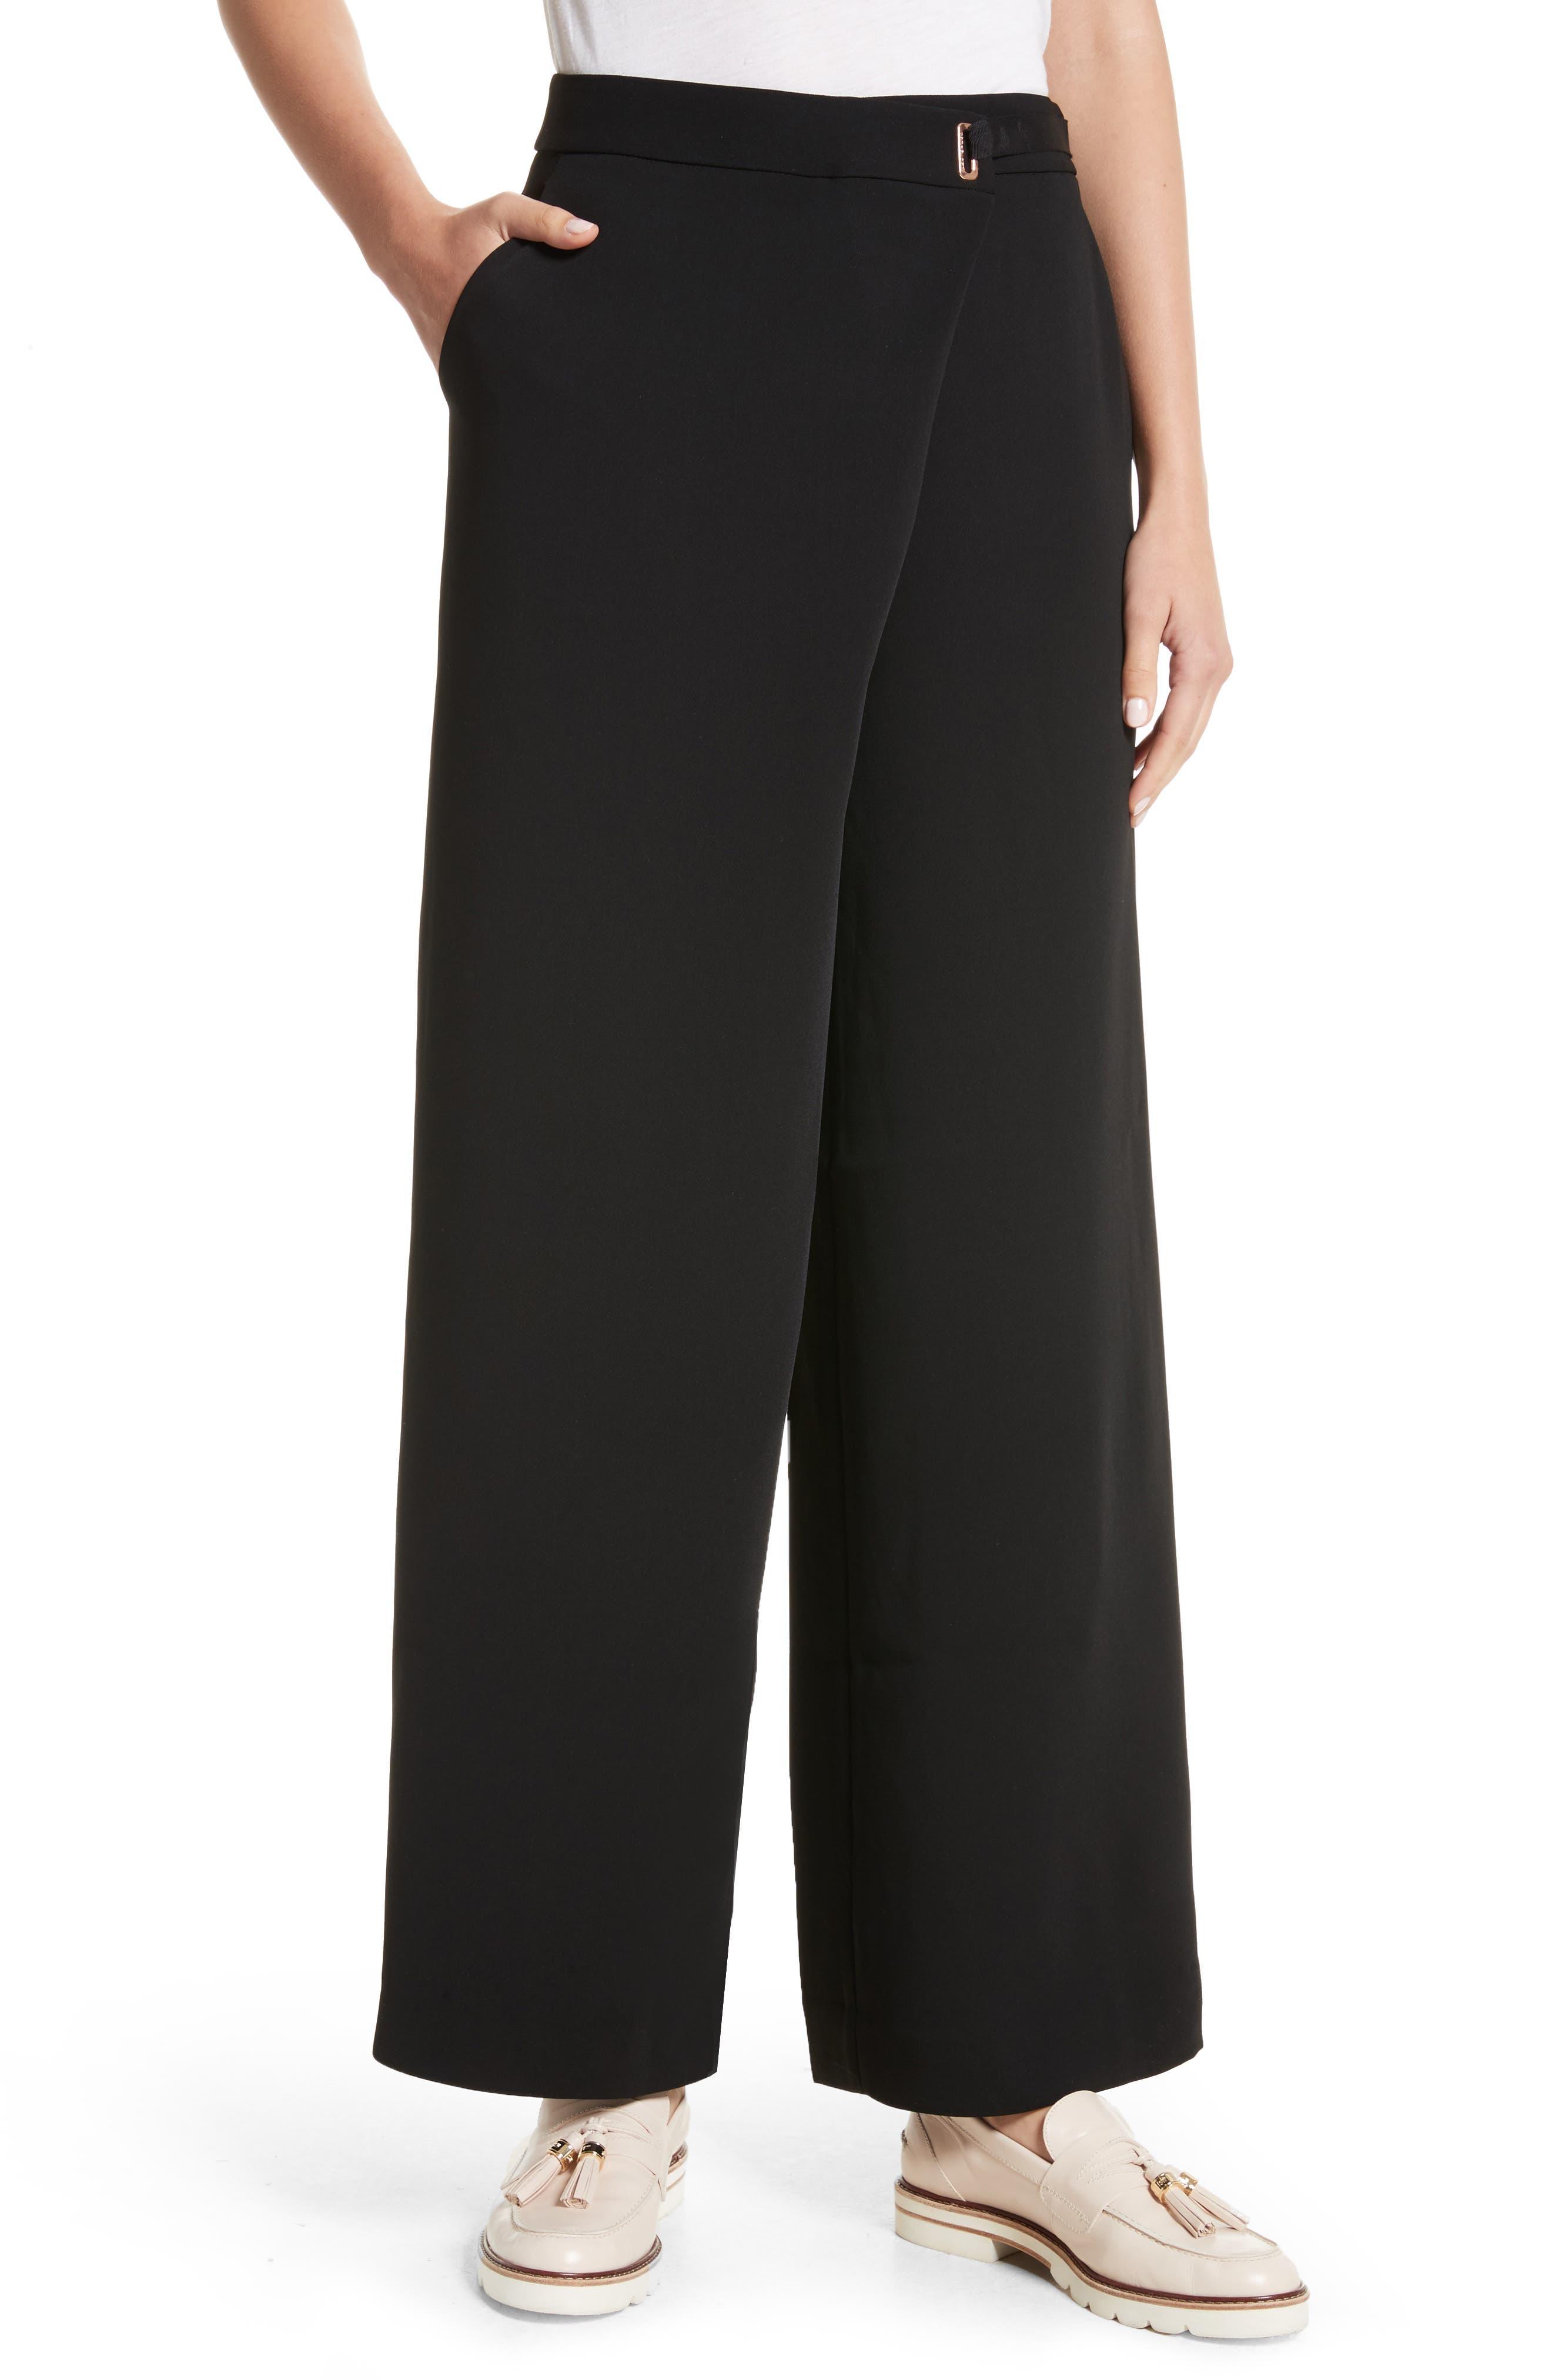 Yasin Wide Leg Wrap Front Trousers,                         Main,                         color, Black